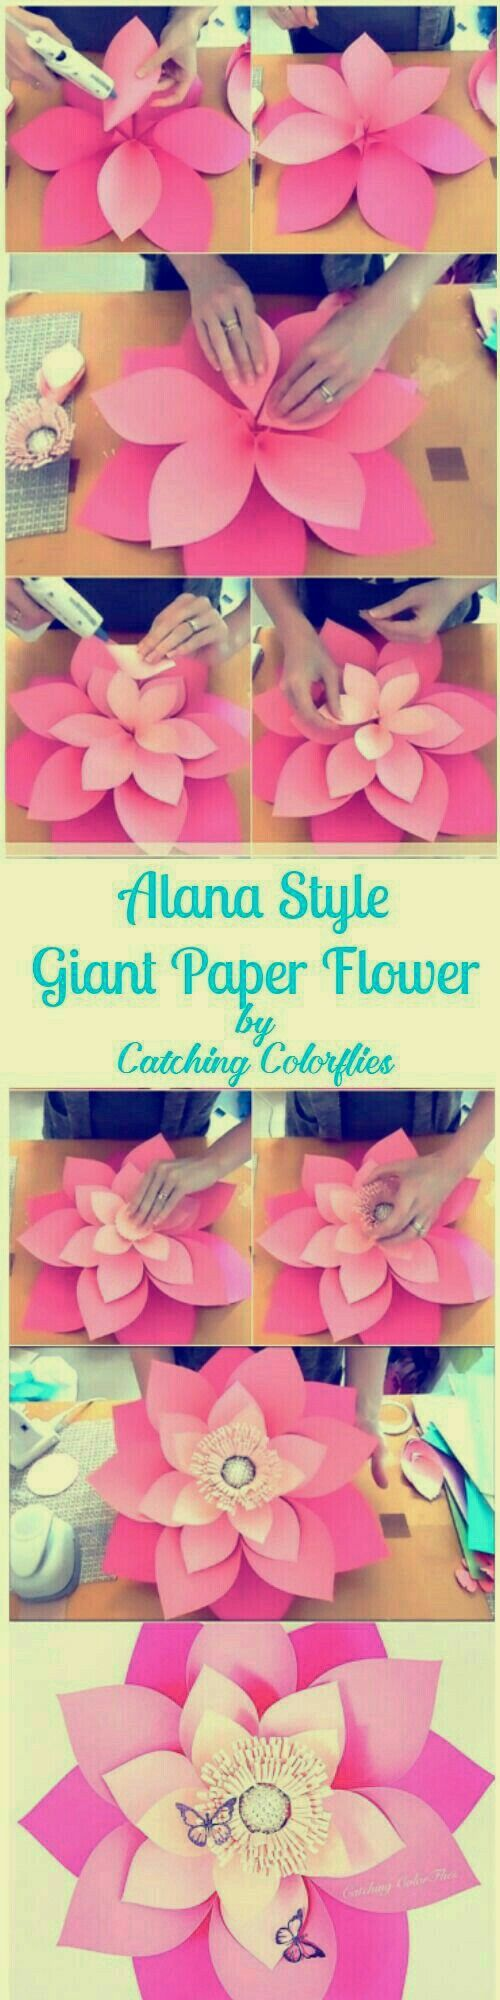 Manualidadesdecoracion  Manualidades  Pinterest  Flowers Craft